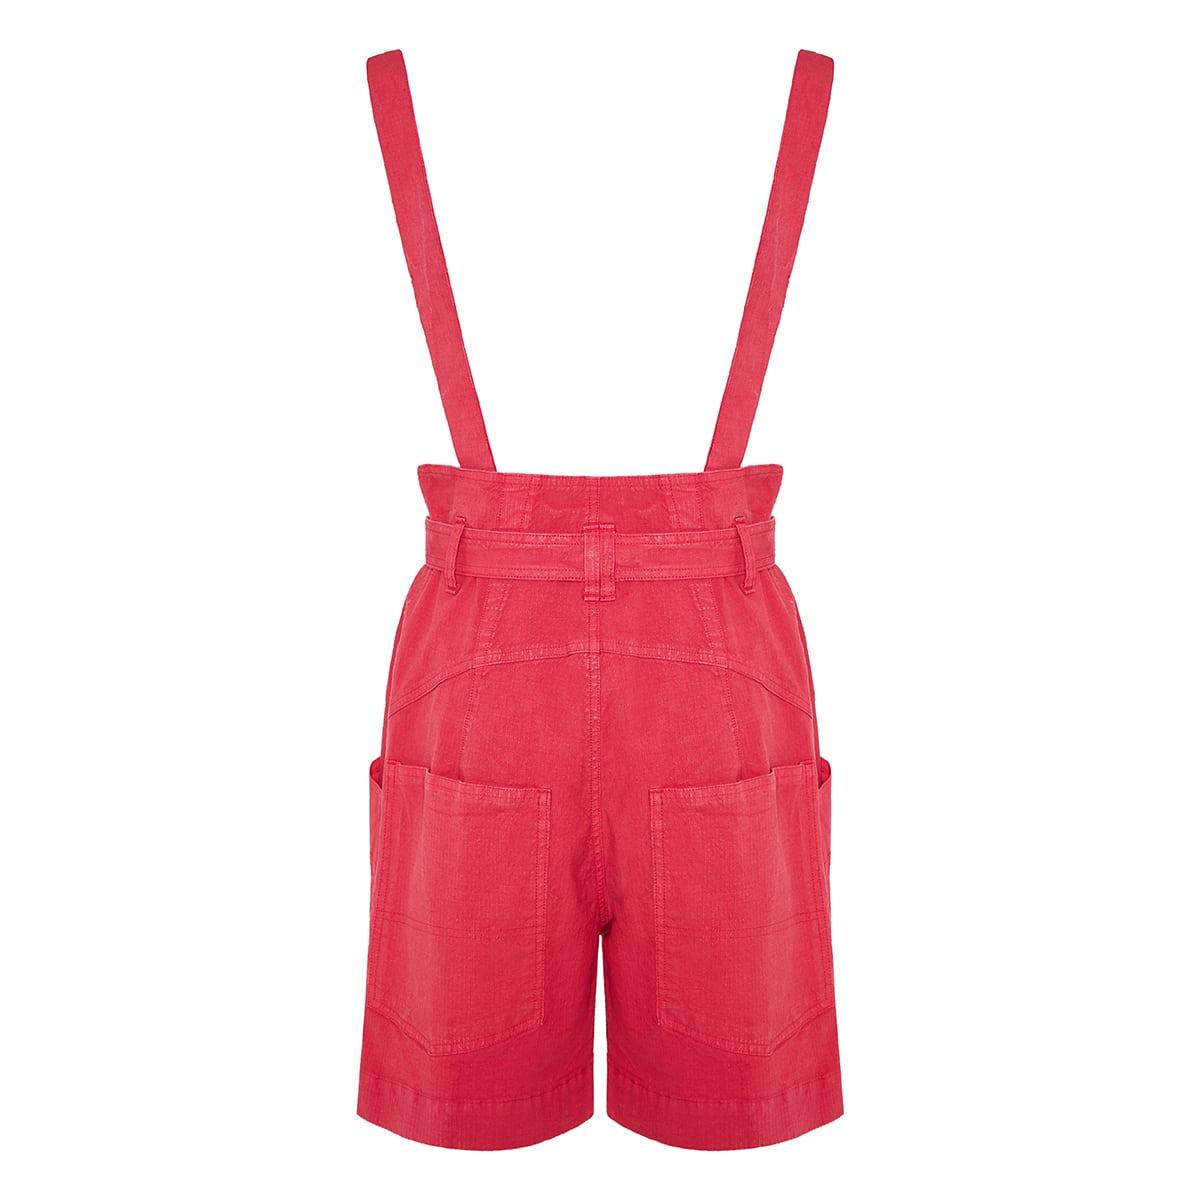 Effie dungaree shorts